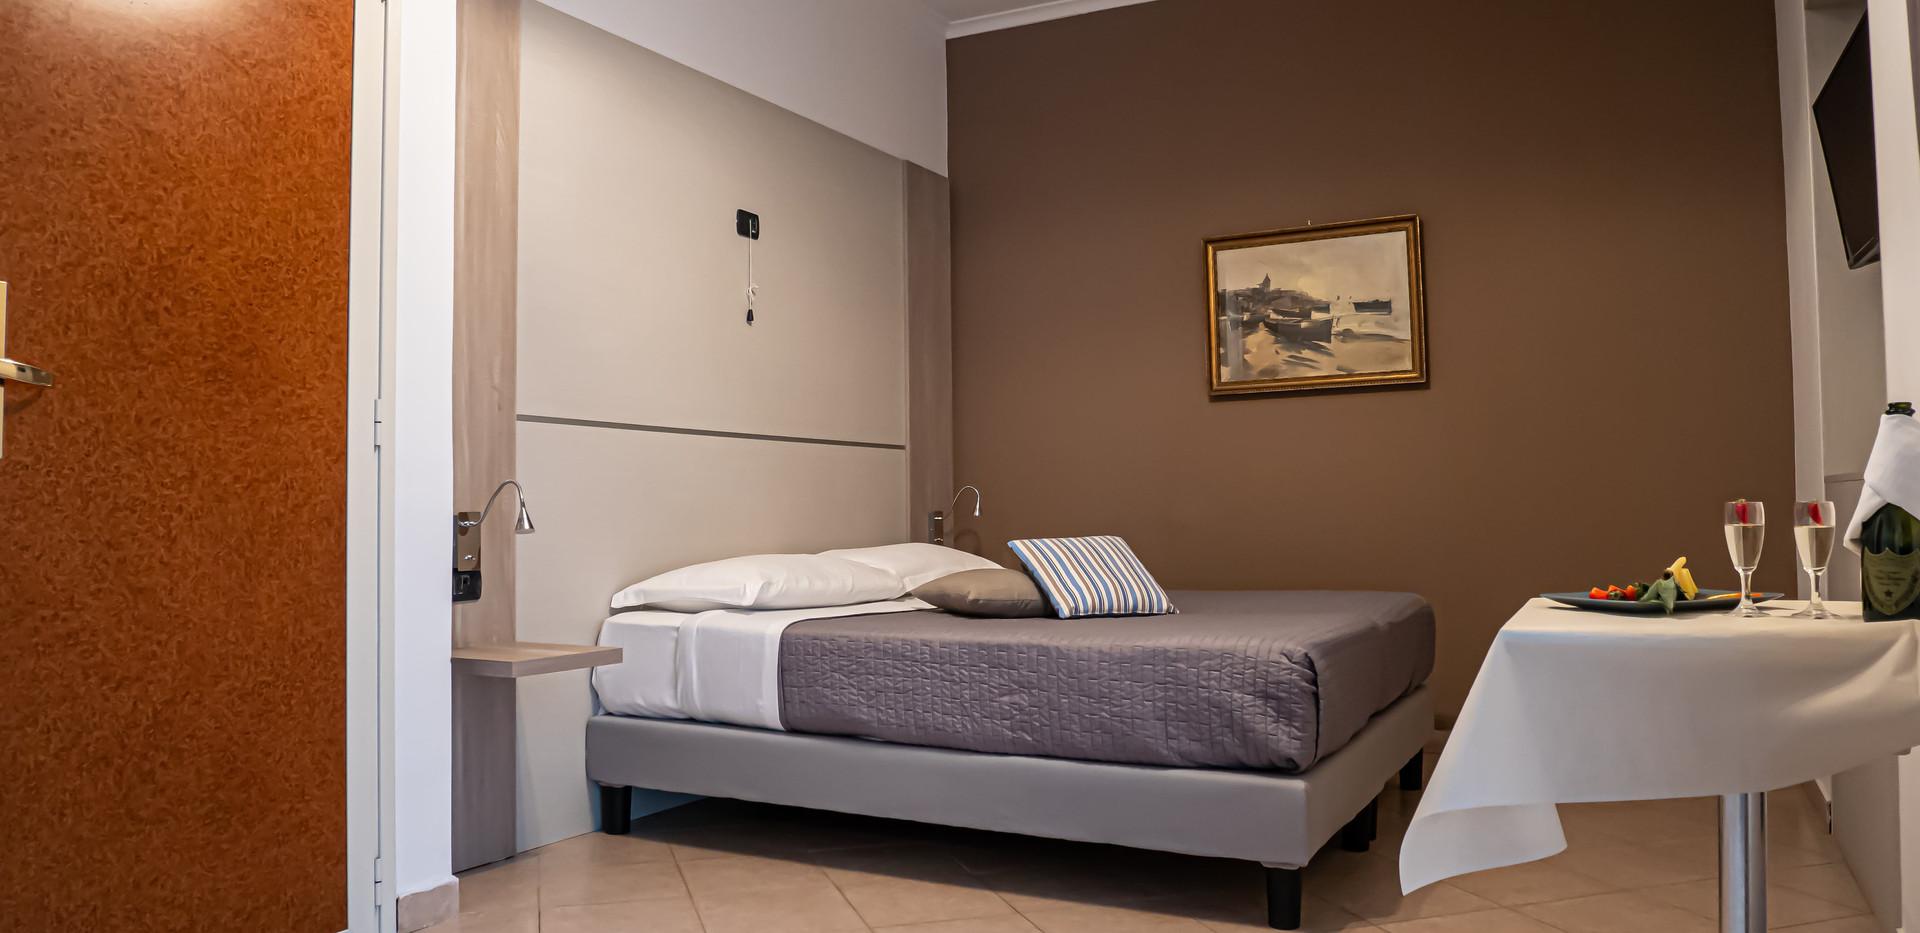 Hotel san Marco - Double Room - 0.jpg